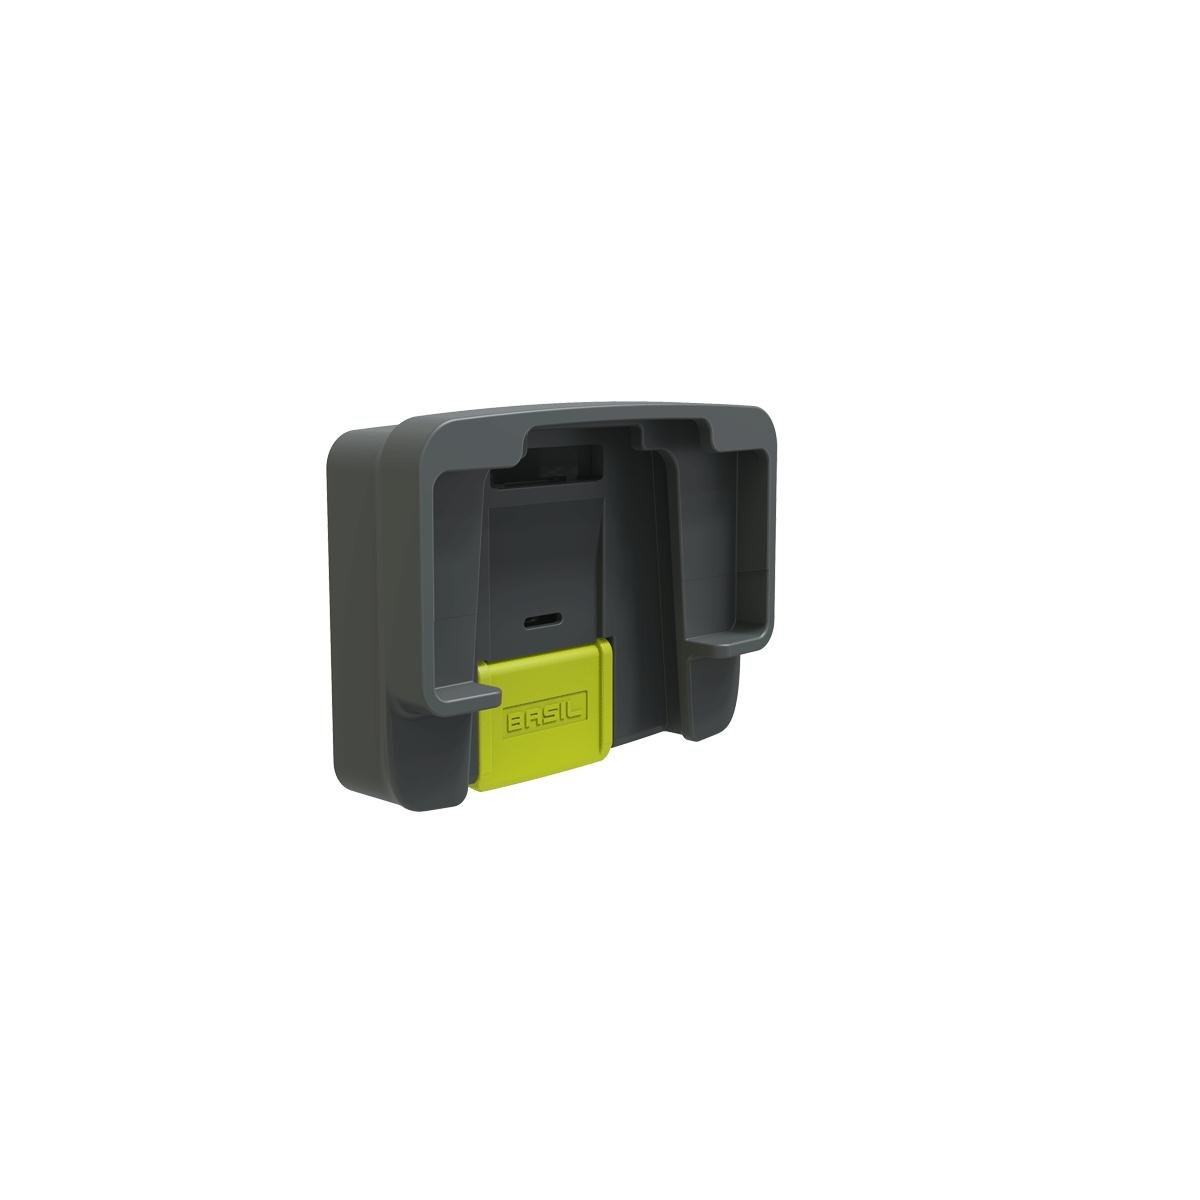 Basil Adapterplatte for Baseasy//Klickfix